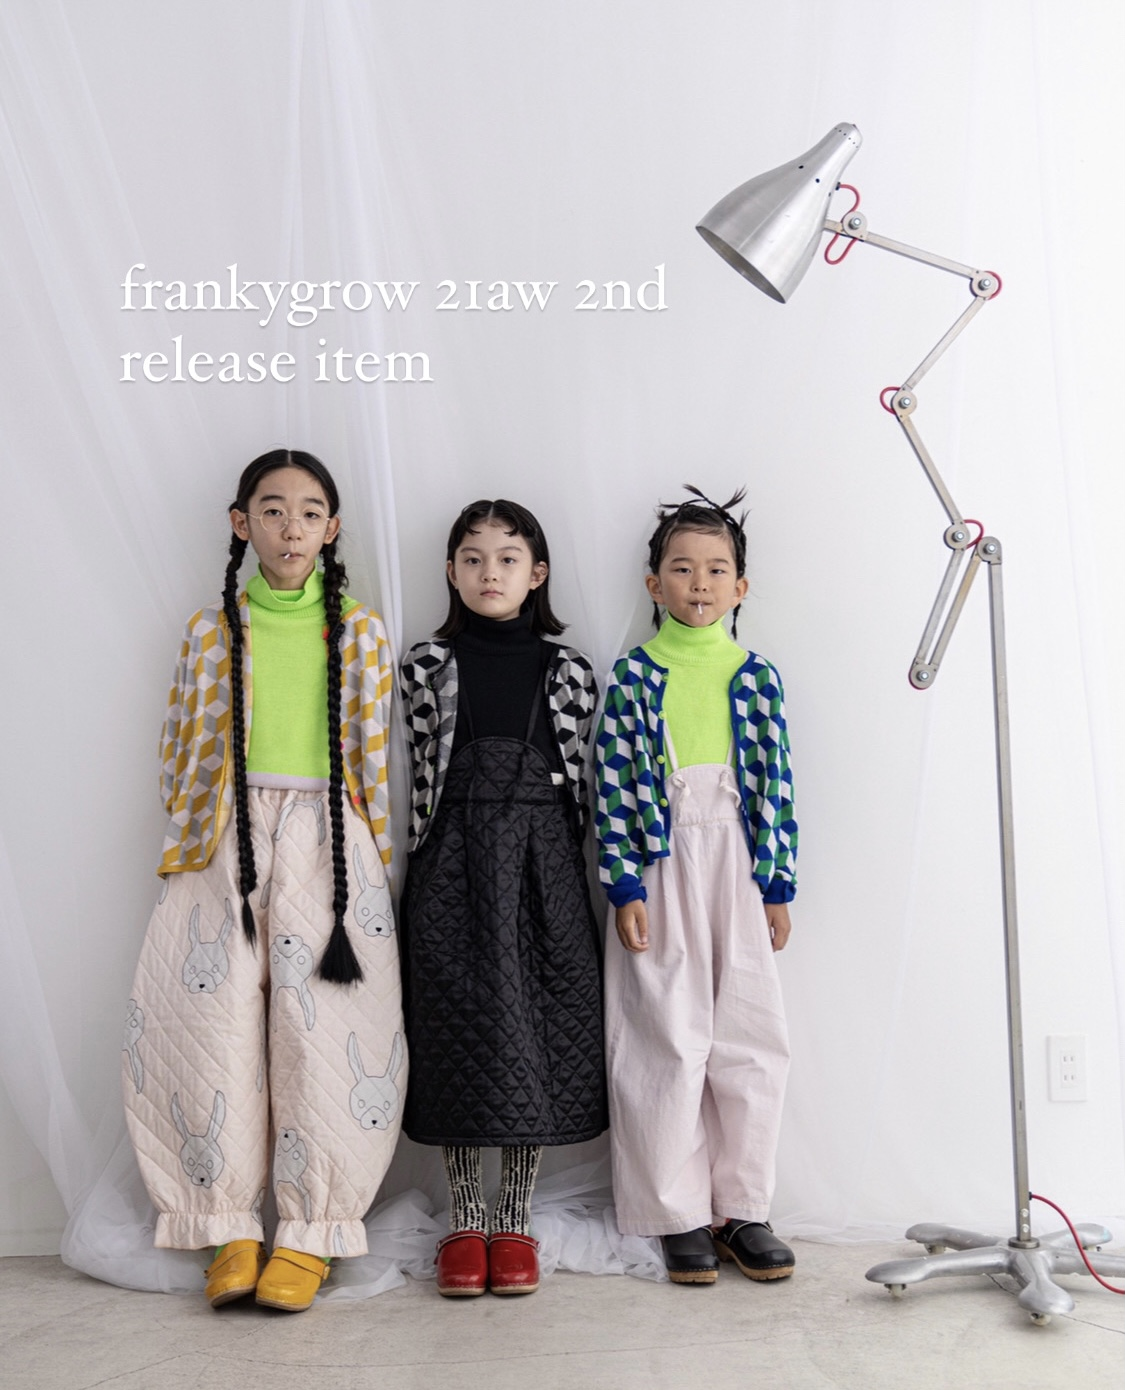 frankygrow2021aw 2nd release item ❸